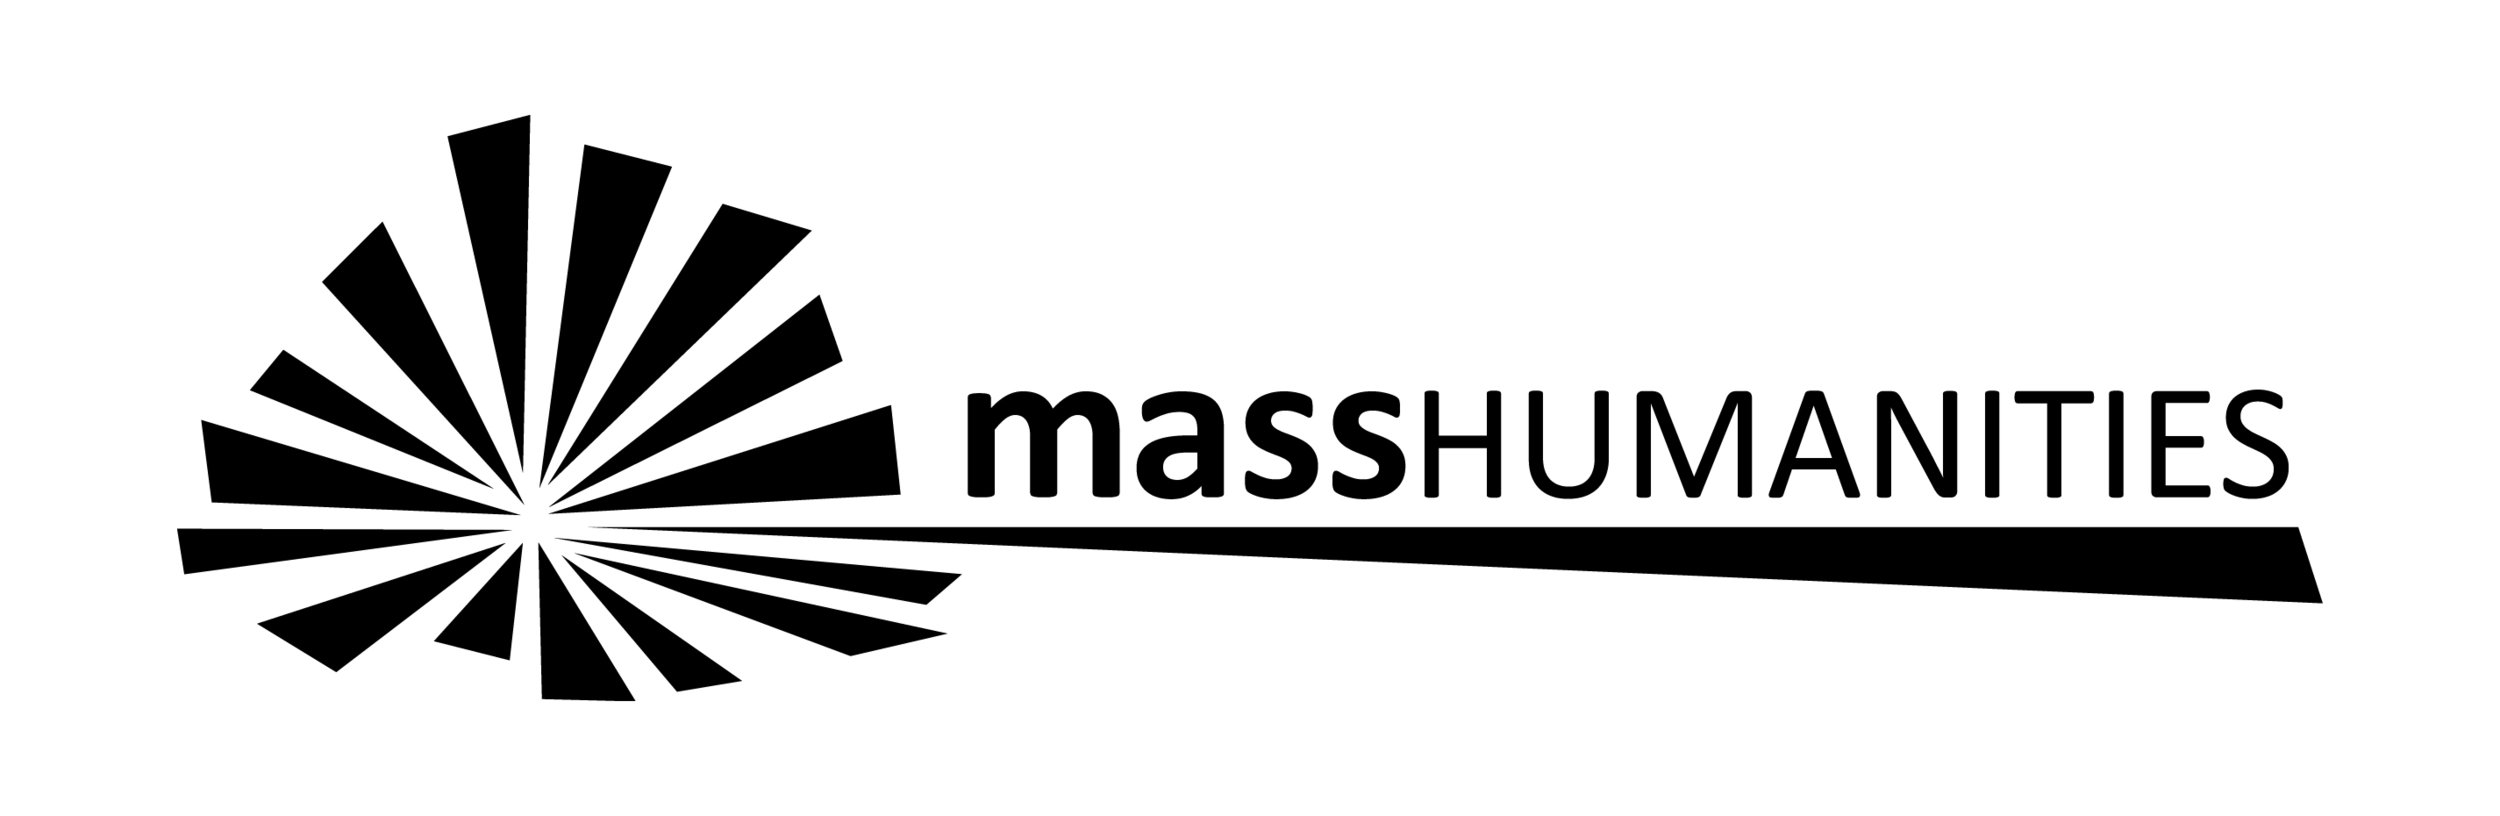 MH_logo-bw.jpg